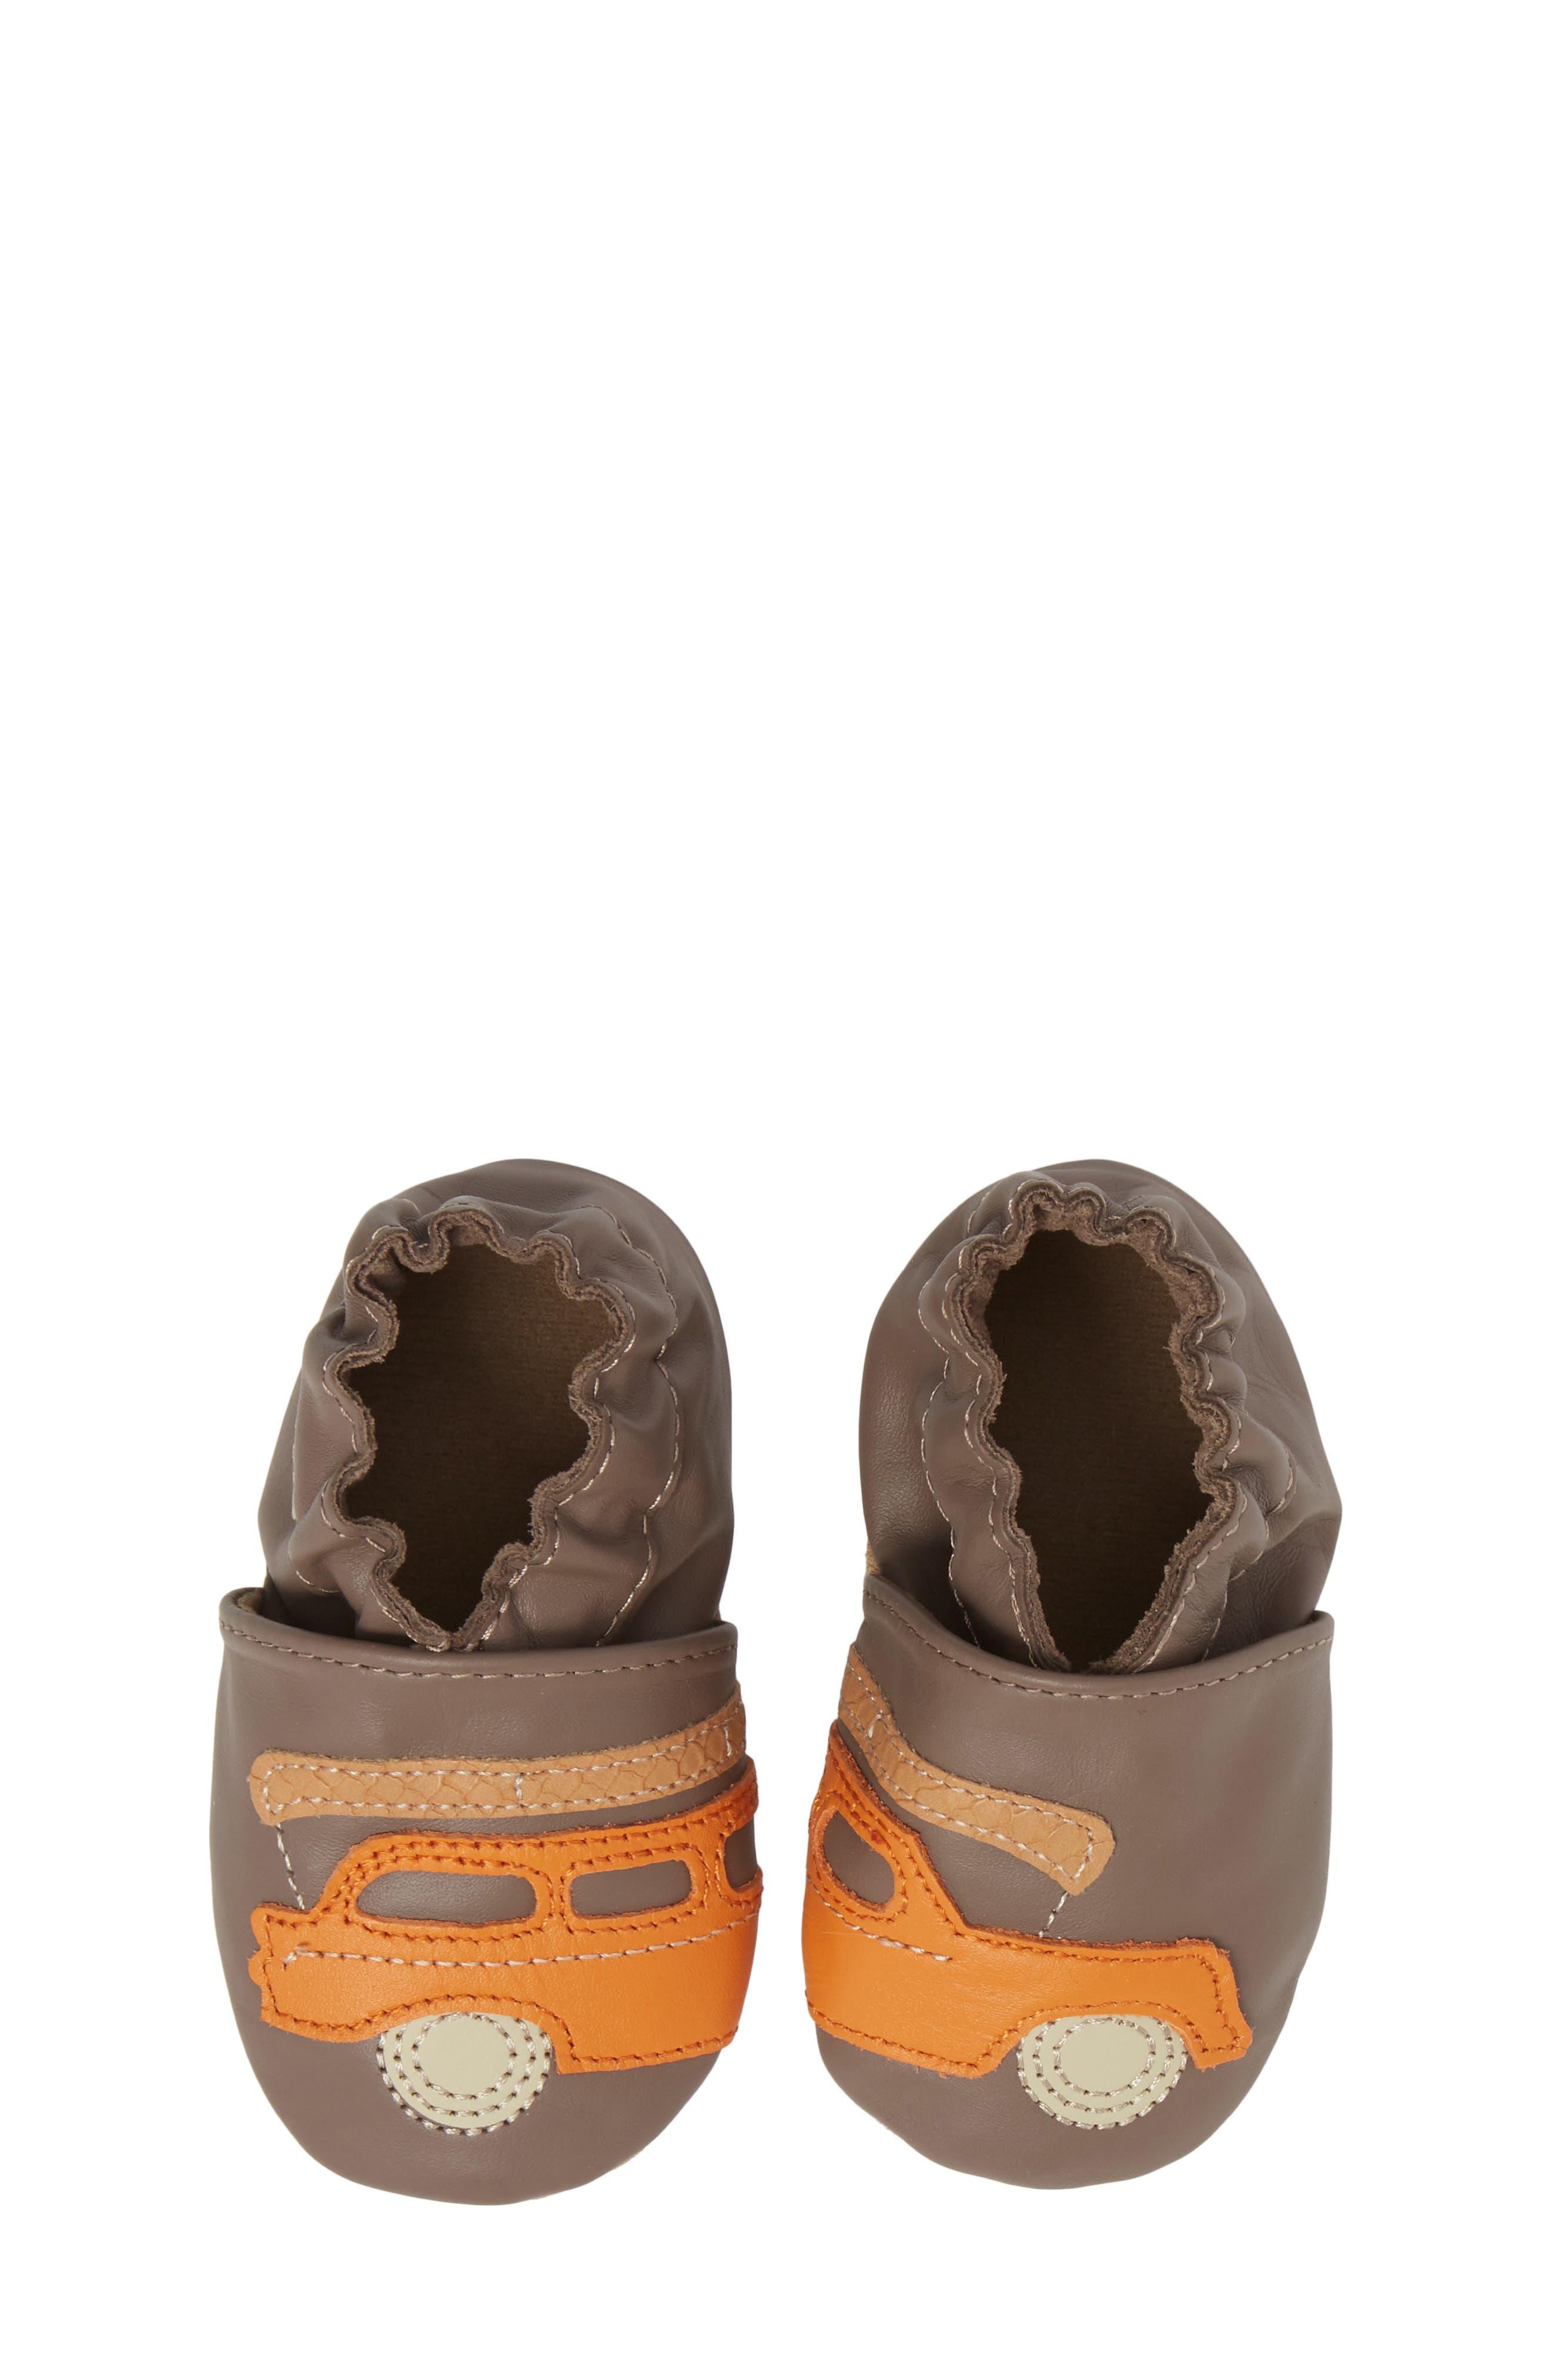 Alternate Image 1 Selected - Robeez® Life is an Adventure Crib Shoe (Baby & Walker)